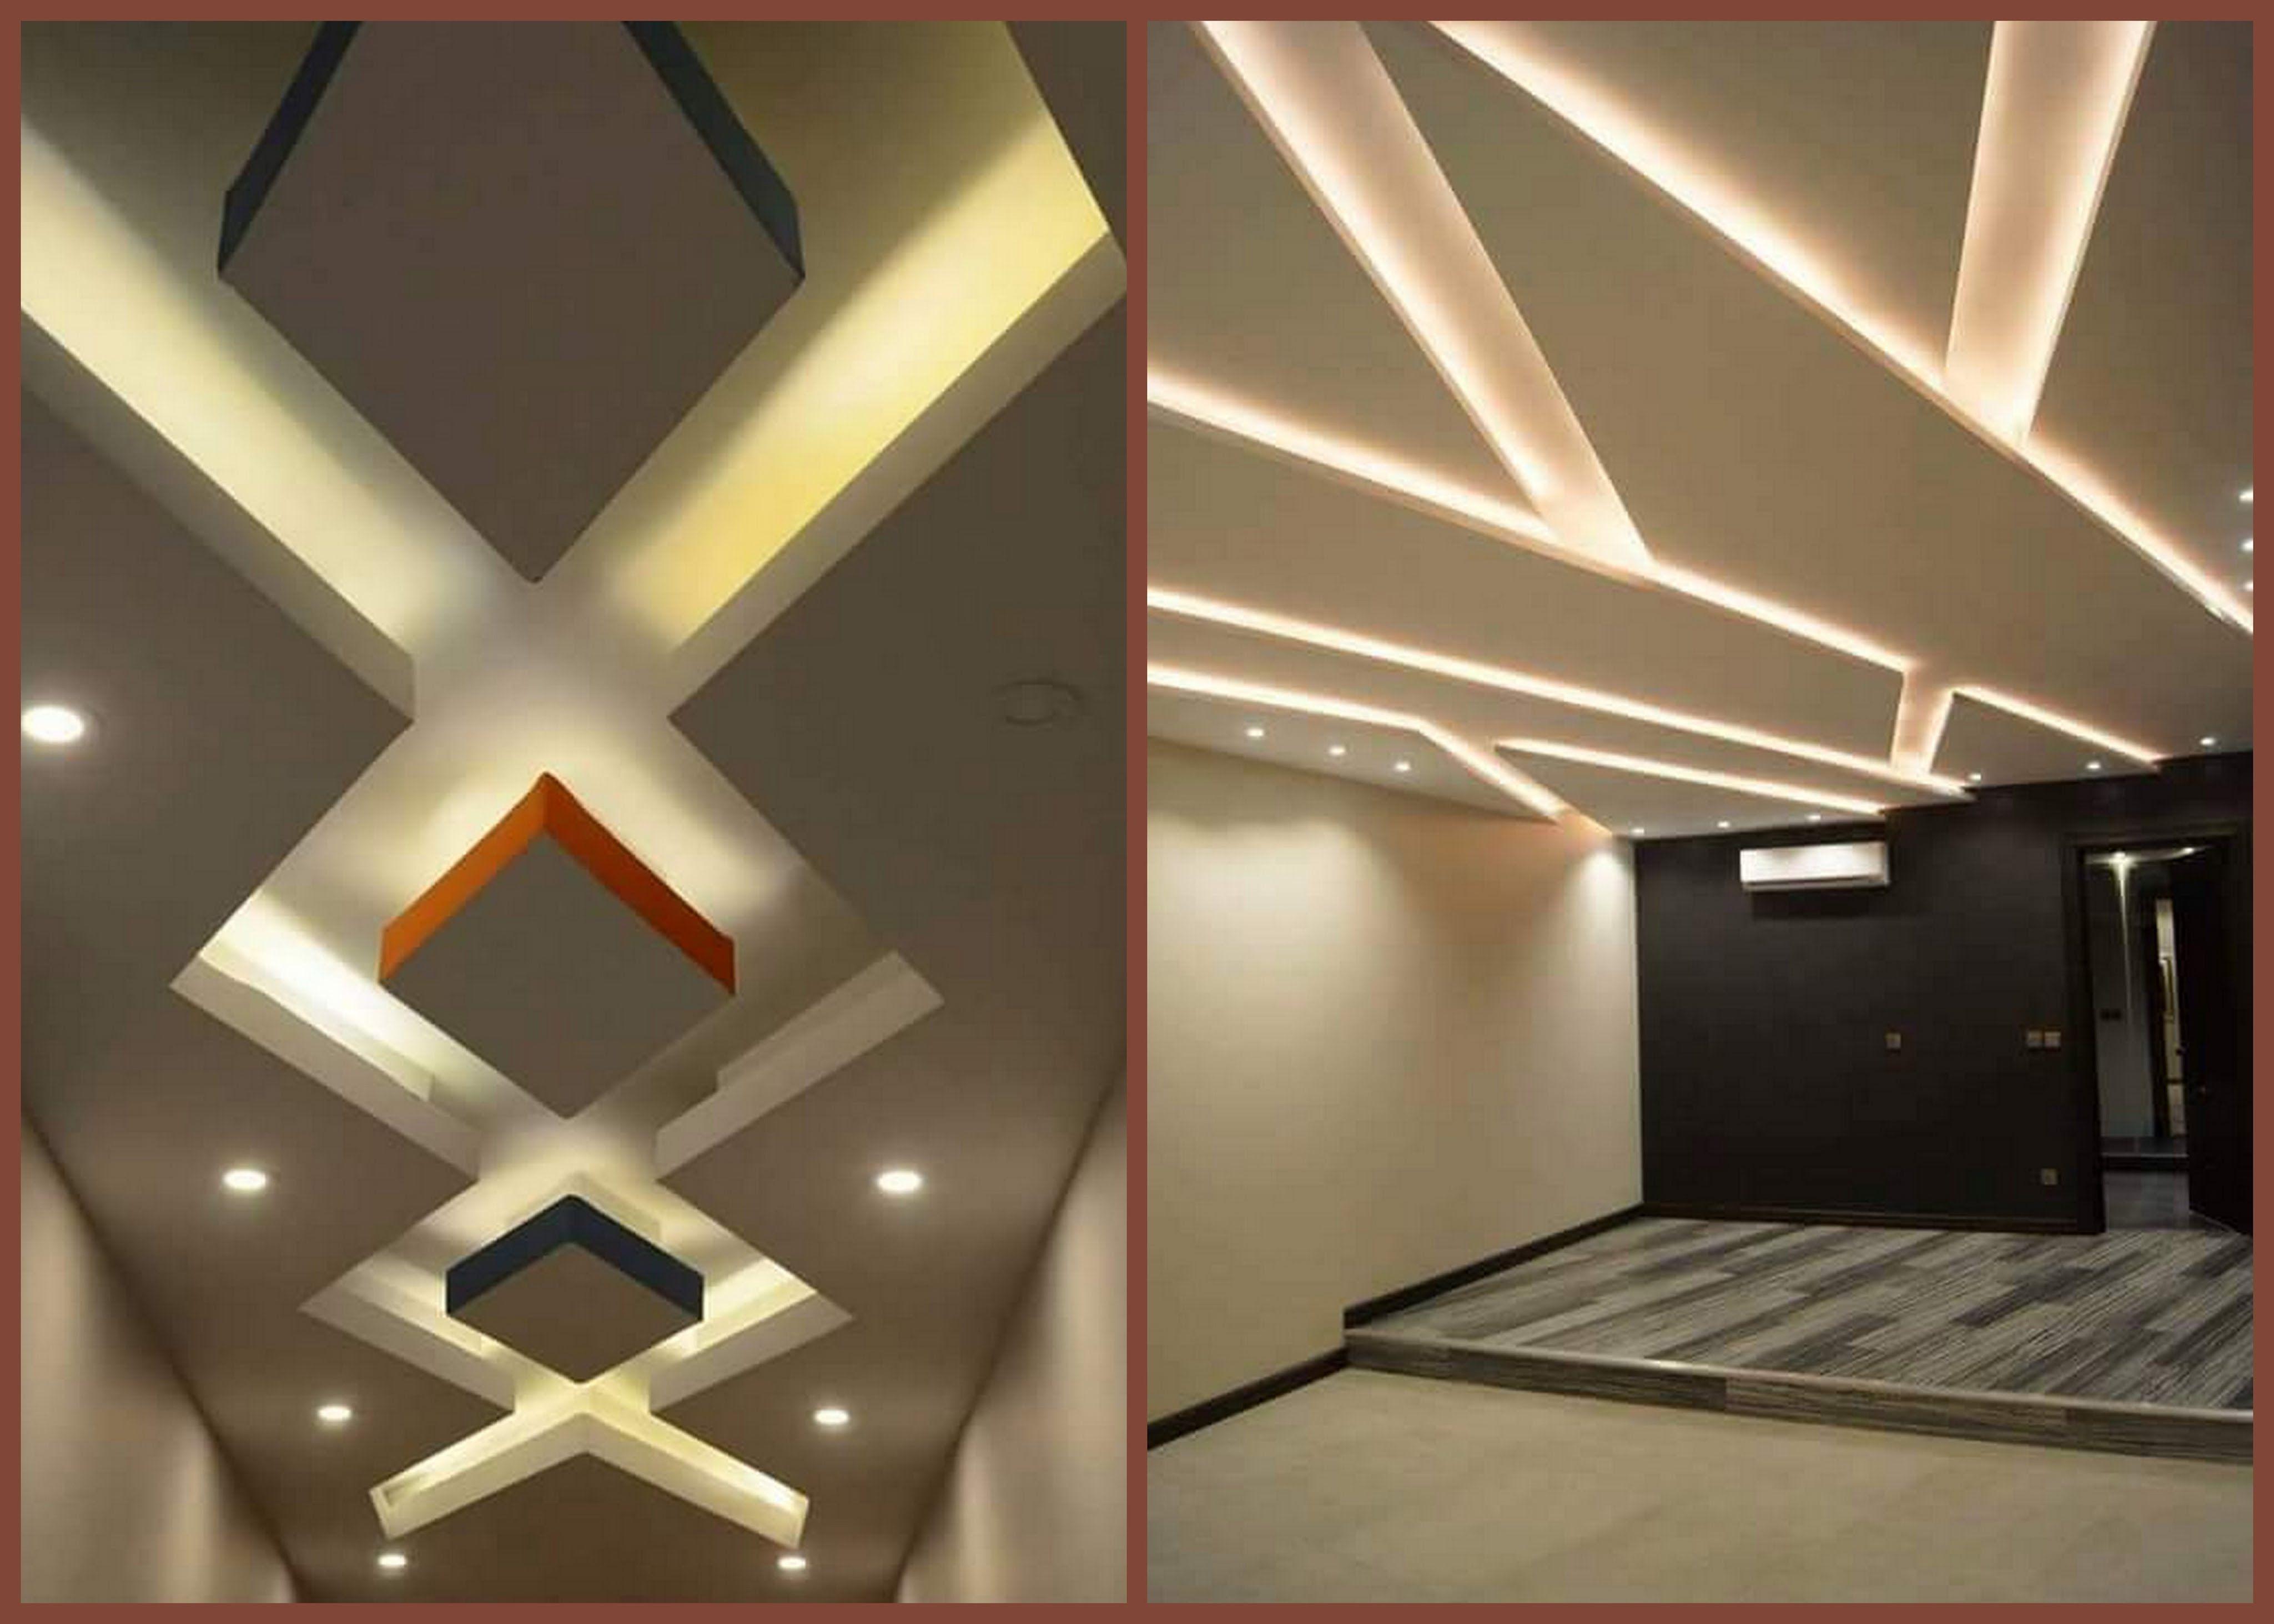 drop led lights panel size uk mowebs ideas options fittings of elegant ceiling can suspended lighting full modular light